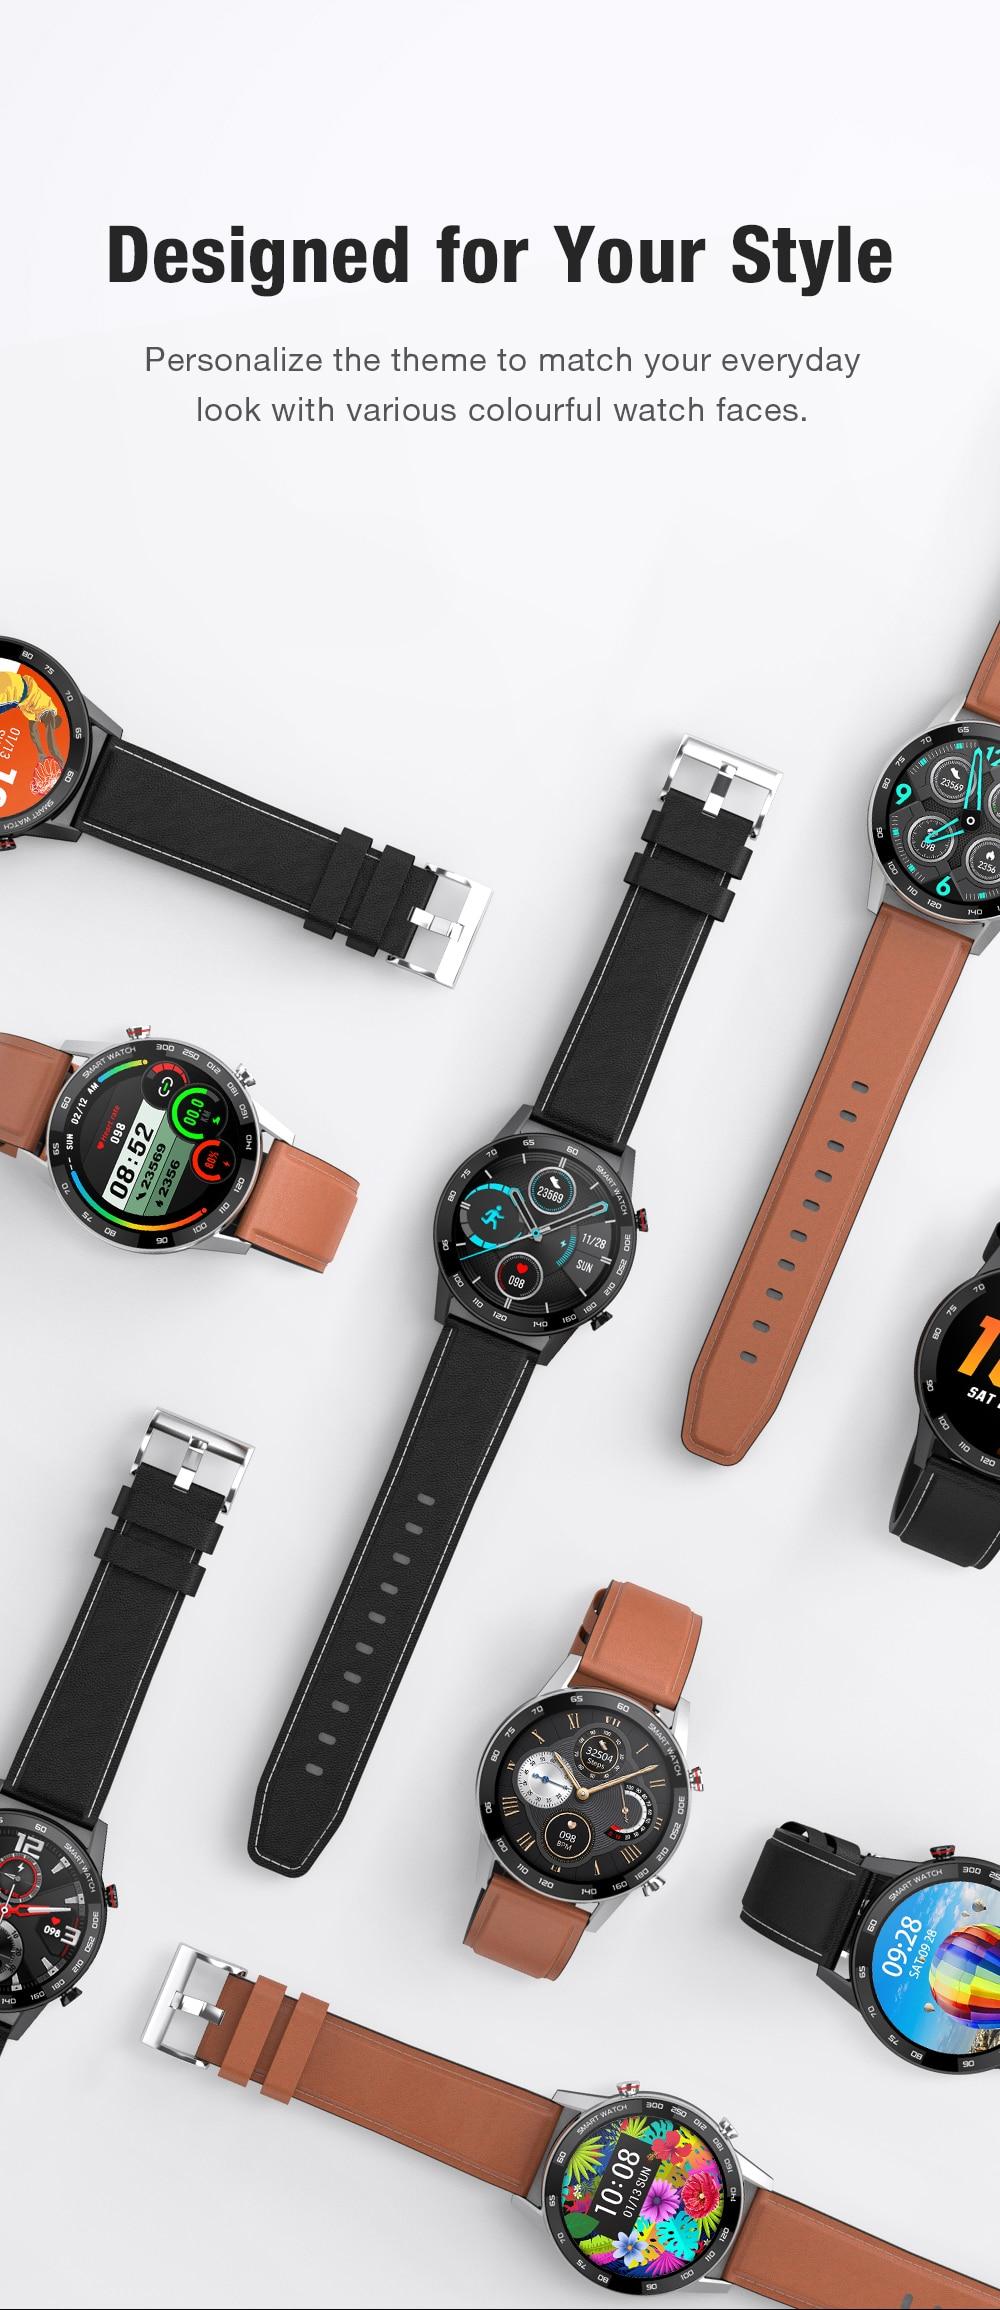 Hb71a19771d9542fba787667051b696f39 2021 SANLEPUS ECG Smart Watch Dial Call Smartwatch Men Sport Fitness Bracelet Clock Watches For Android Apple Xiaomi